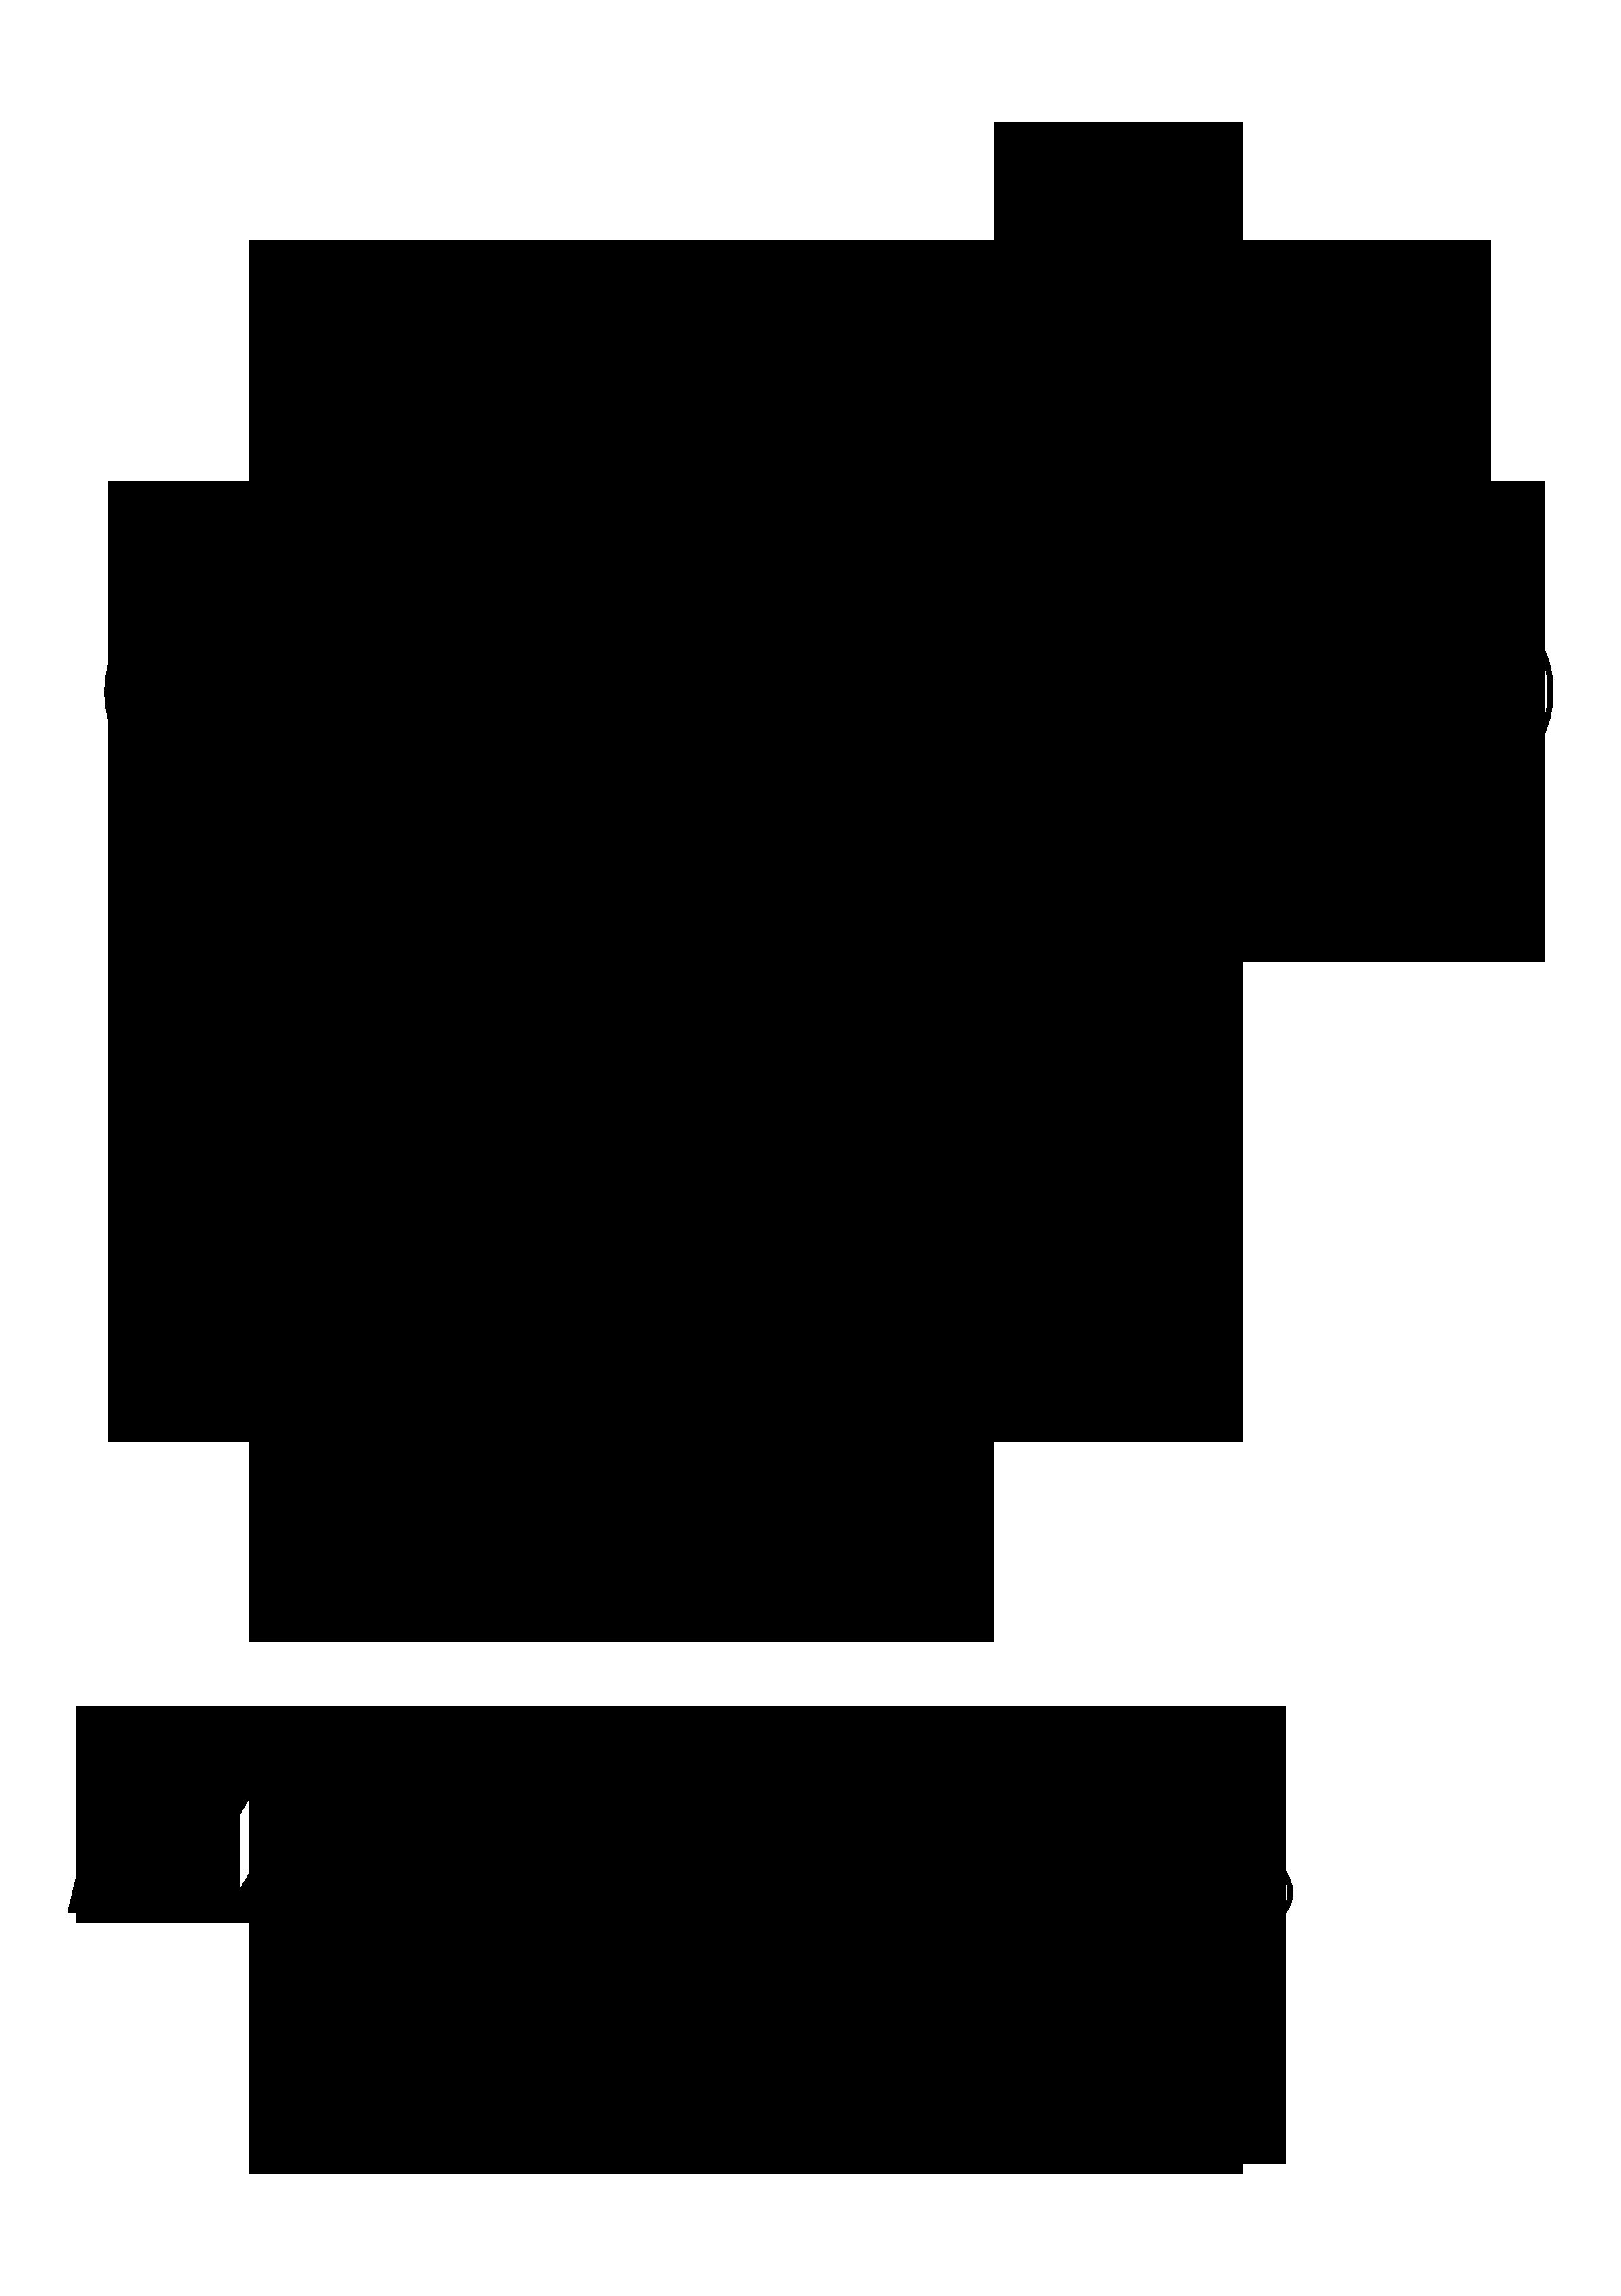 miami heat logo png transparent amp svg vector freebie supply